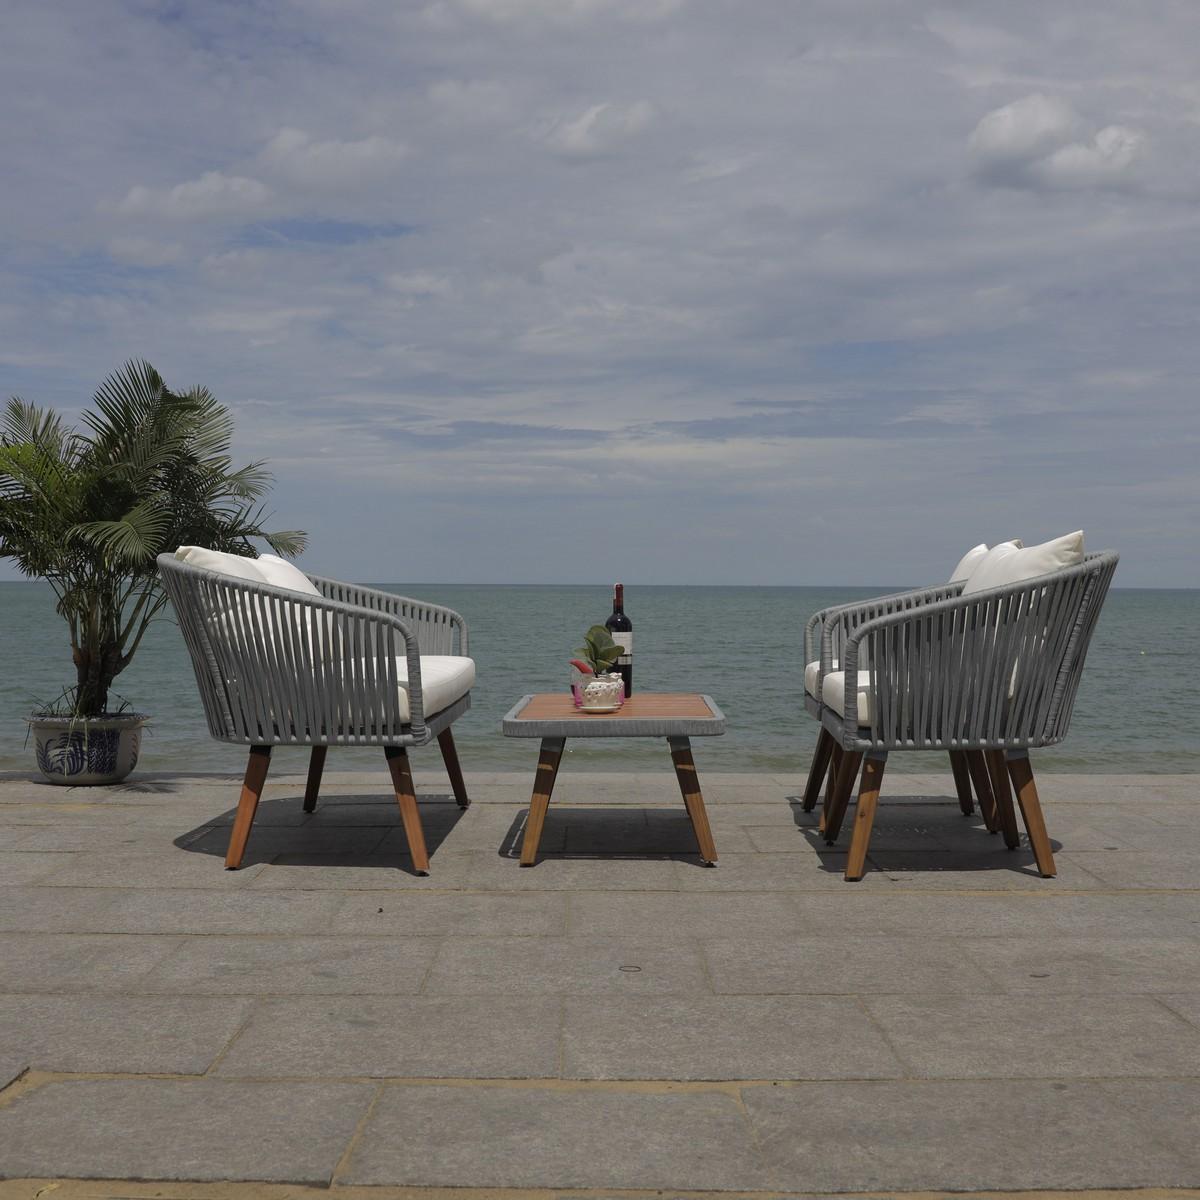 PAT7074A Patio Sets - 4 Piece - Furniture by Safavieh on Safavieh Ransin id=32437